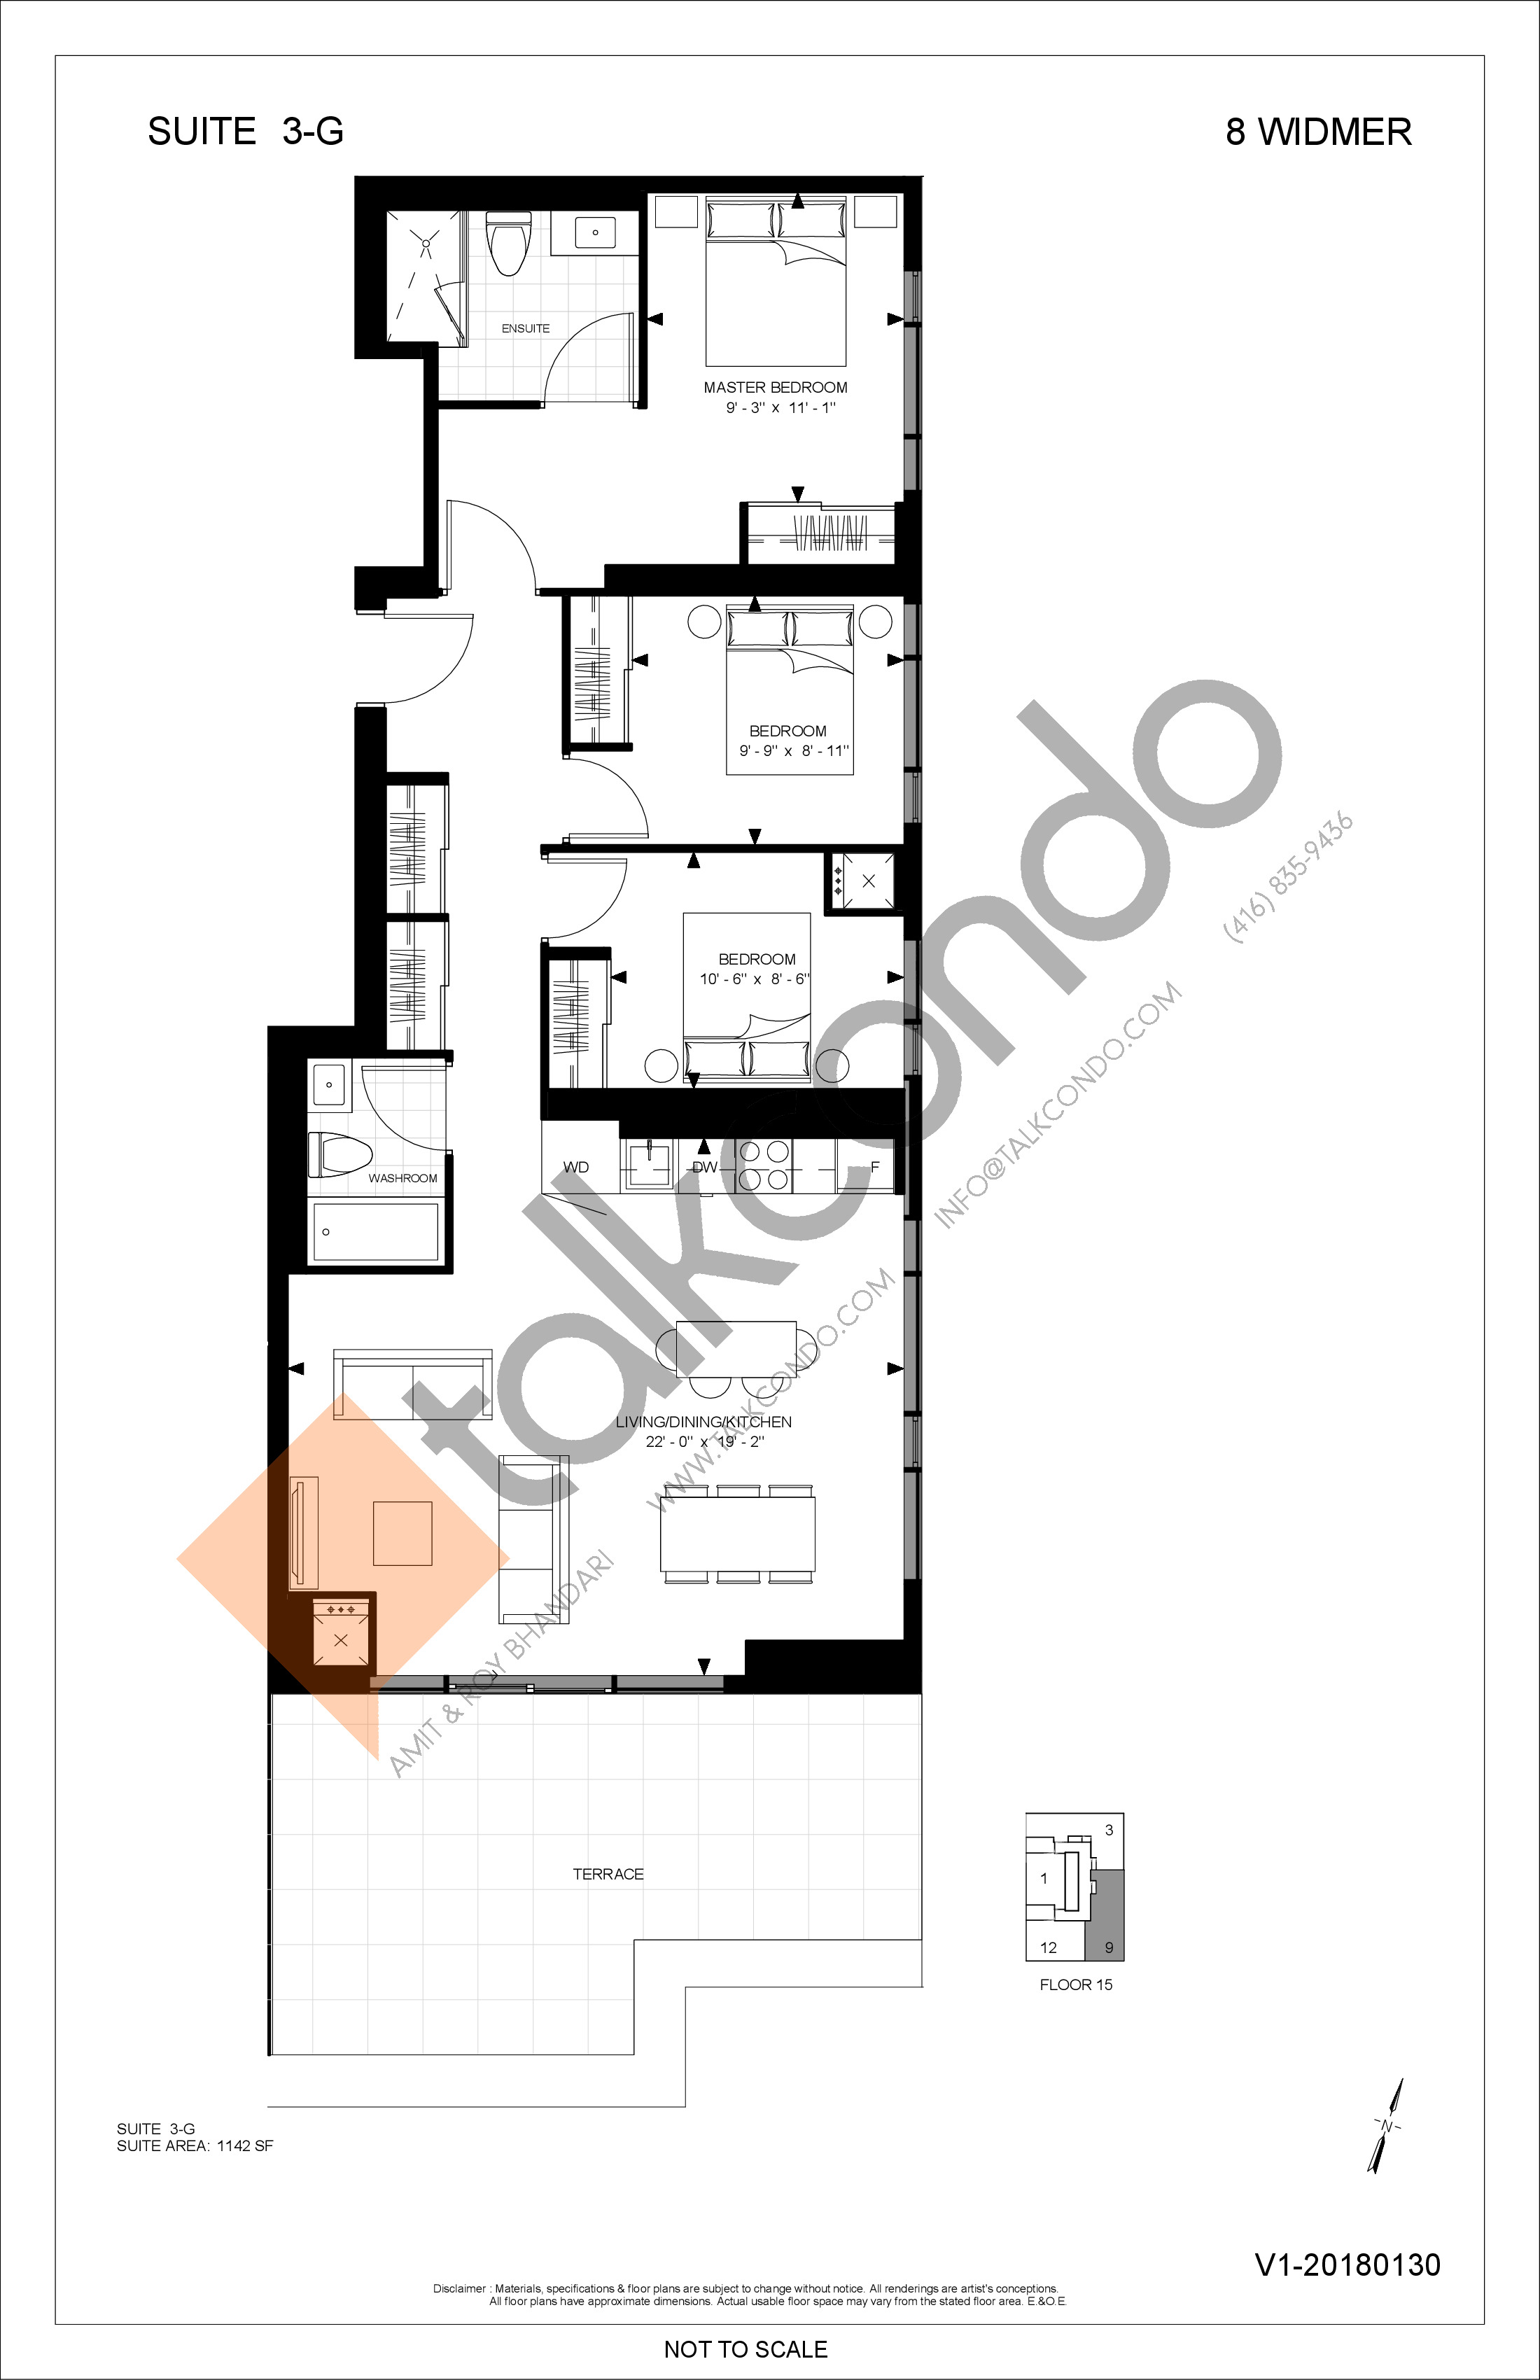 3-G Floor Plan at Encore Theatre District Condos - 1142 sq.ft